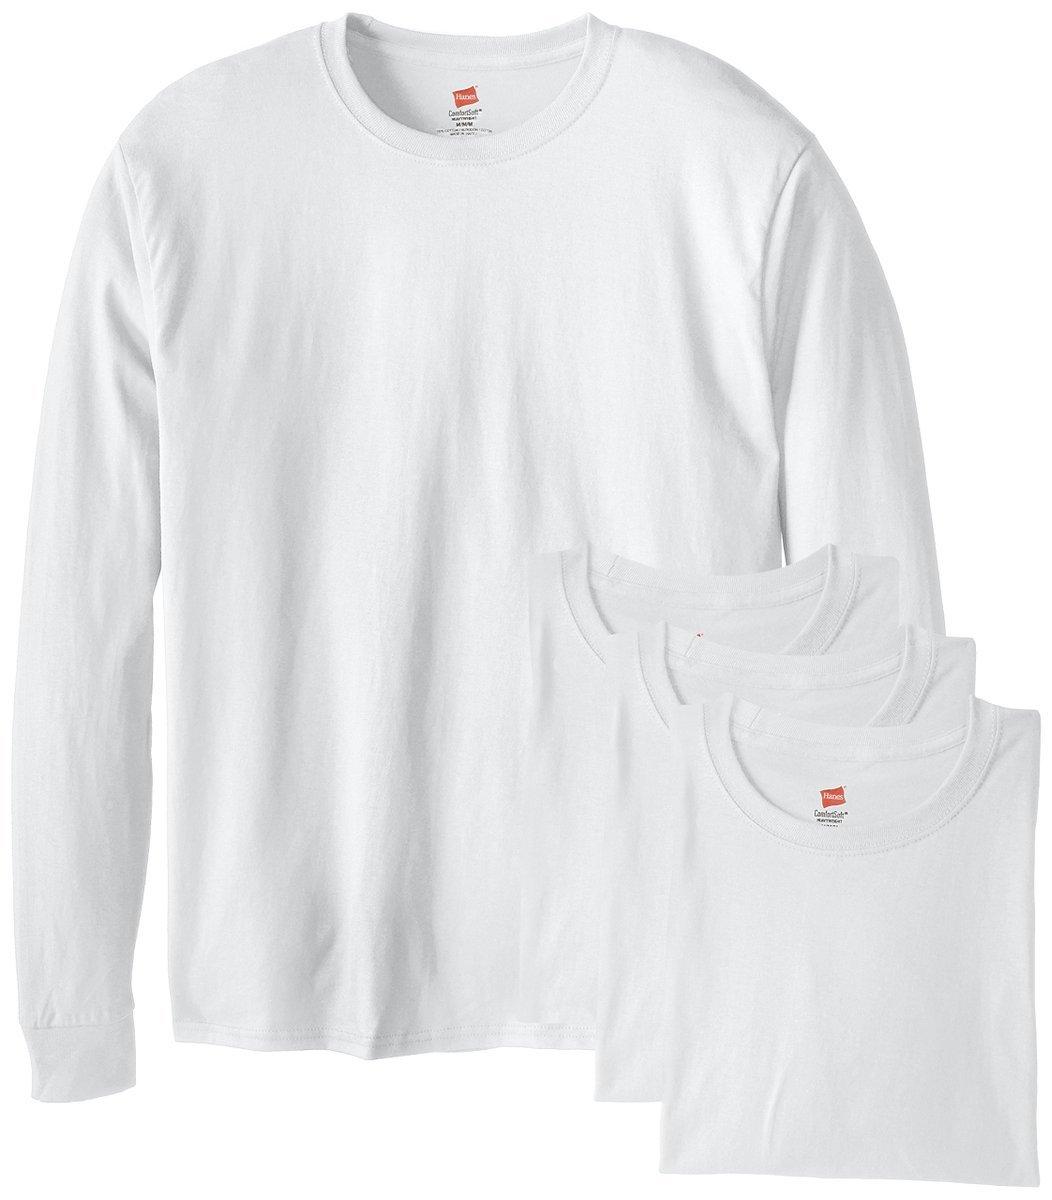 Hanes Men's 4 Pack Long Sleeve Comfortsoft T-Shirt, White, Large